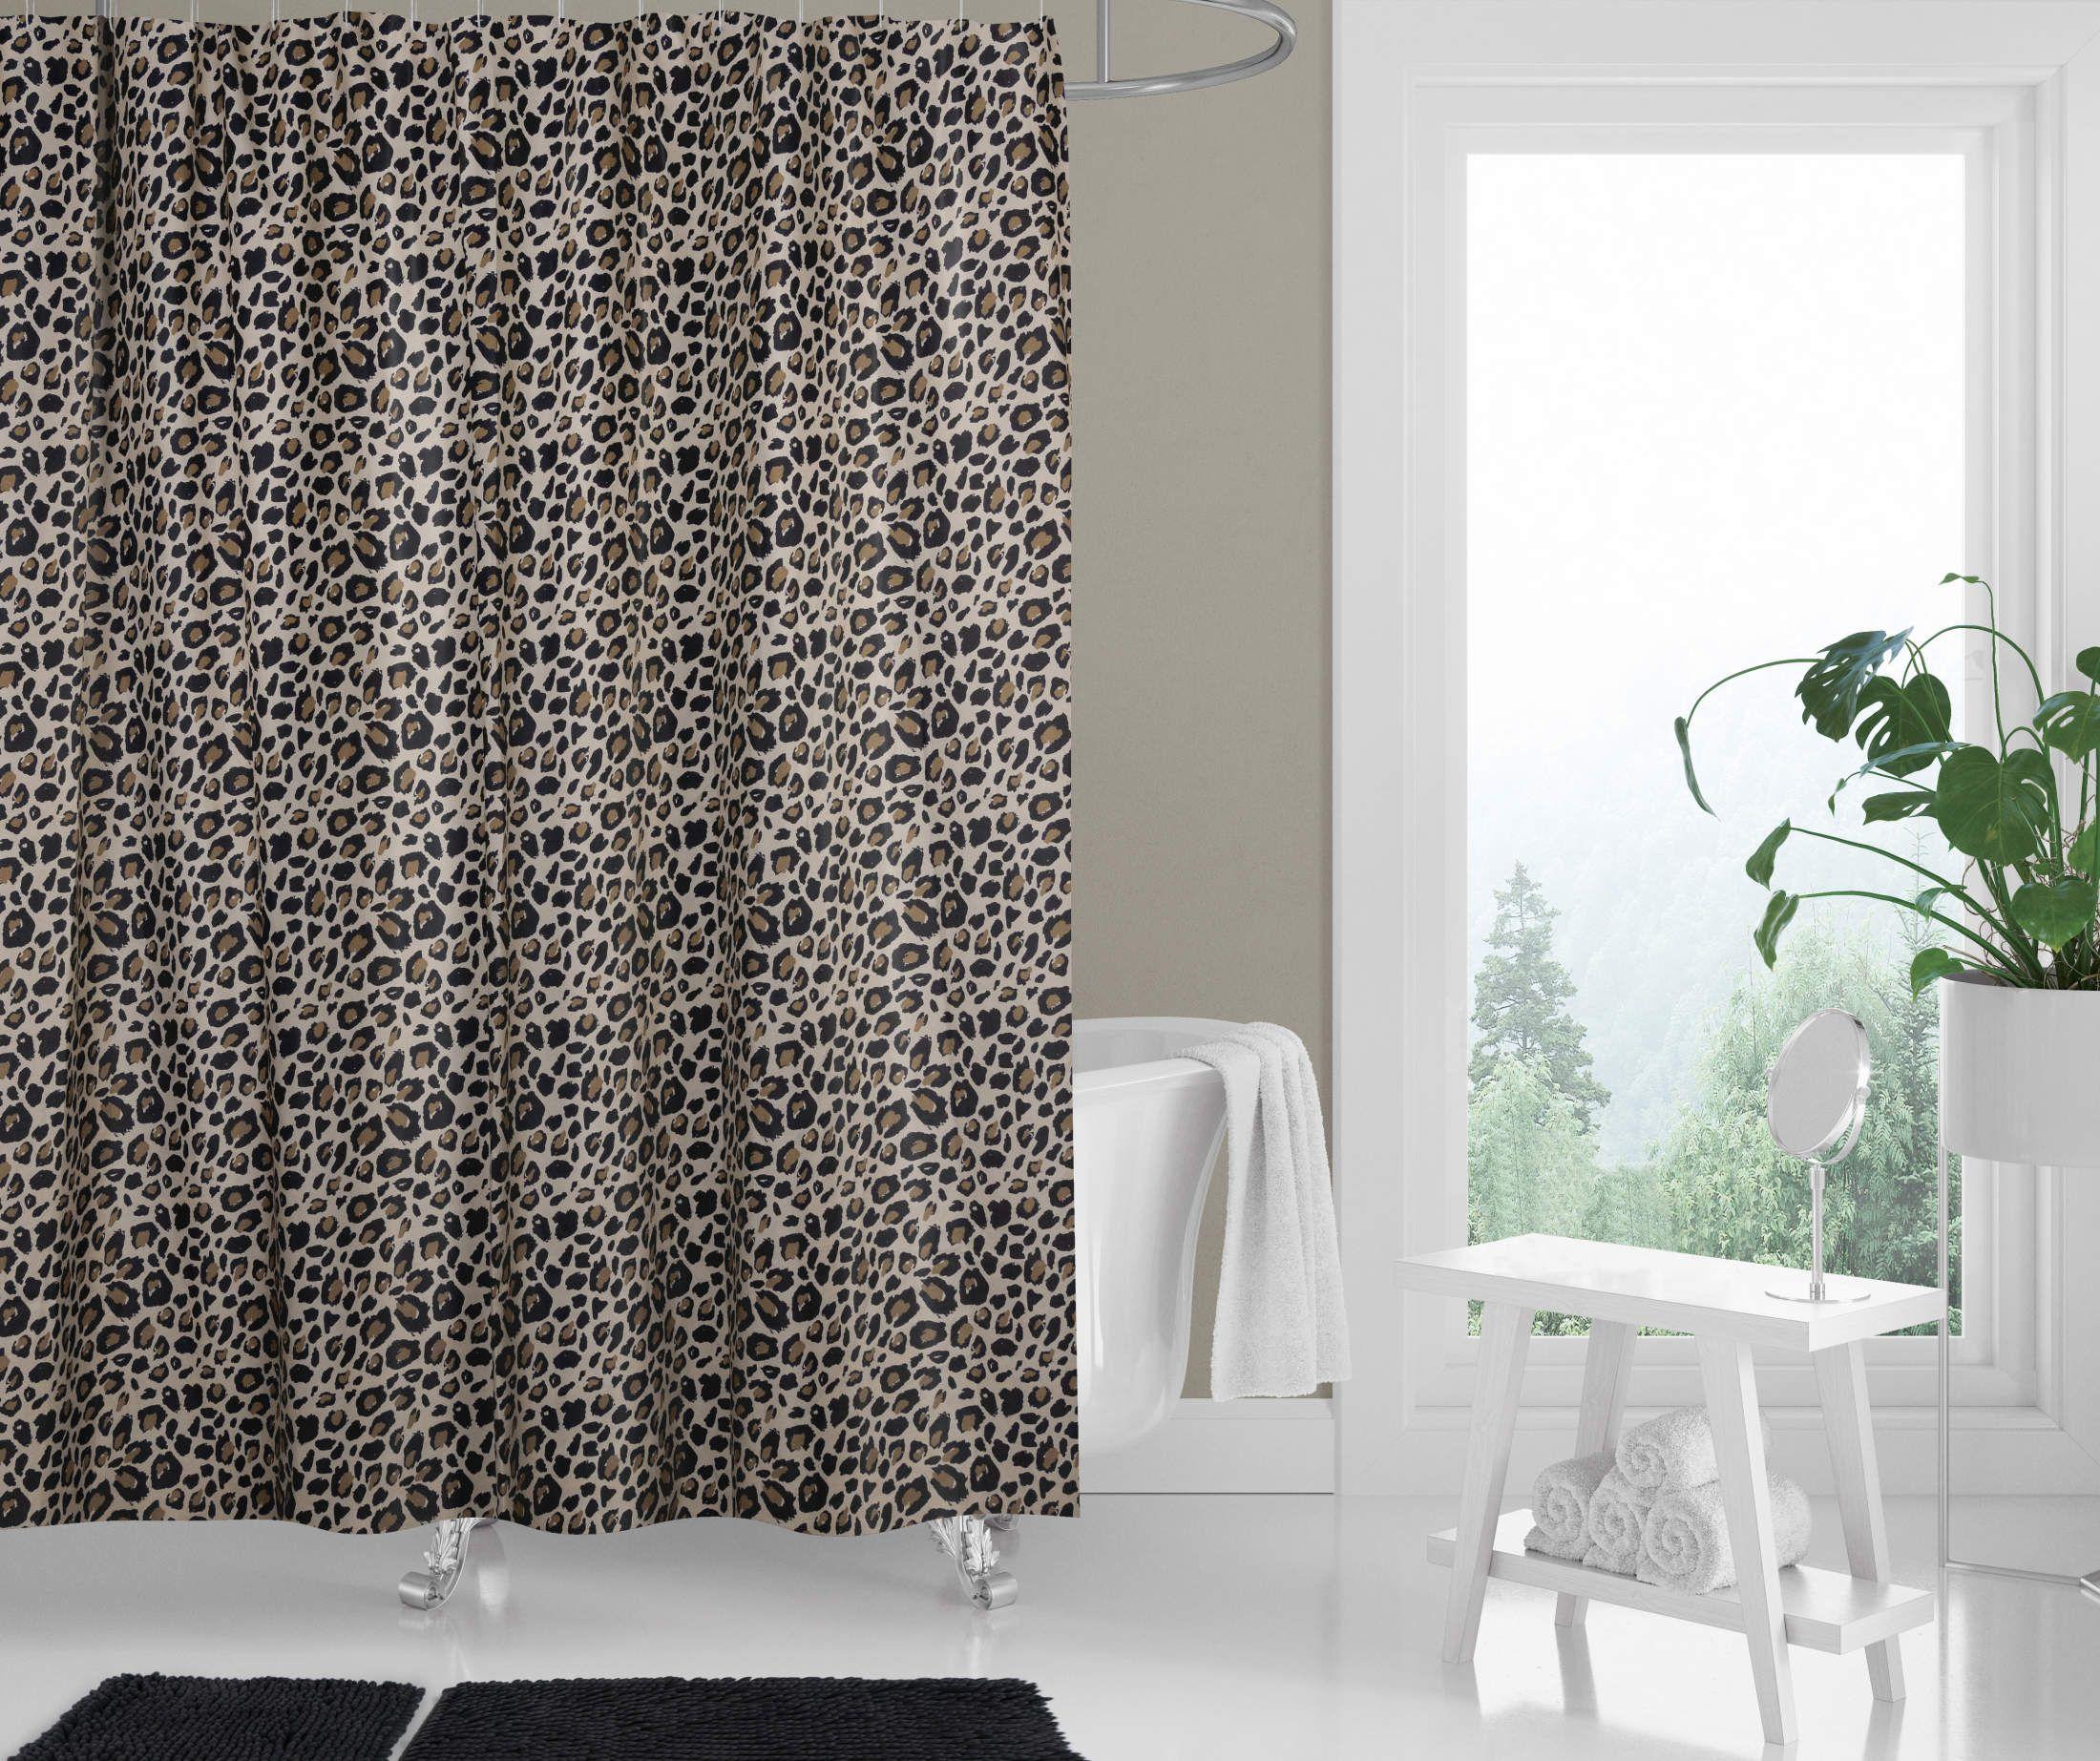 Cheetah Print Shower Curtain & Bath Rugs Set - Big Lots in 8